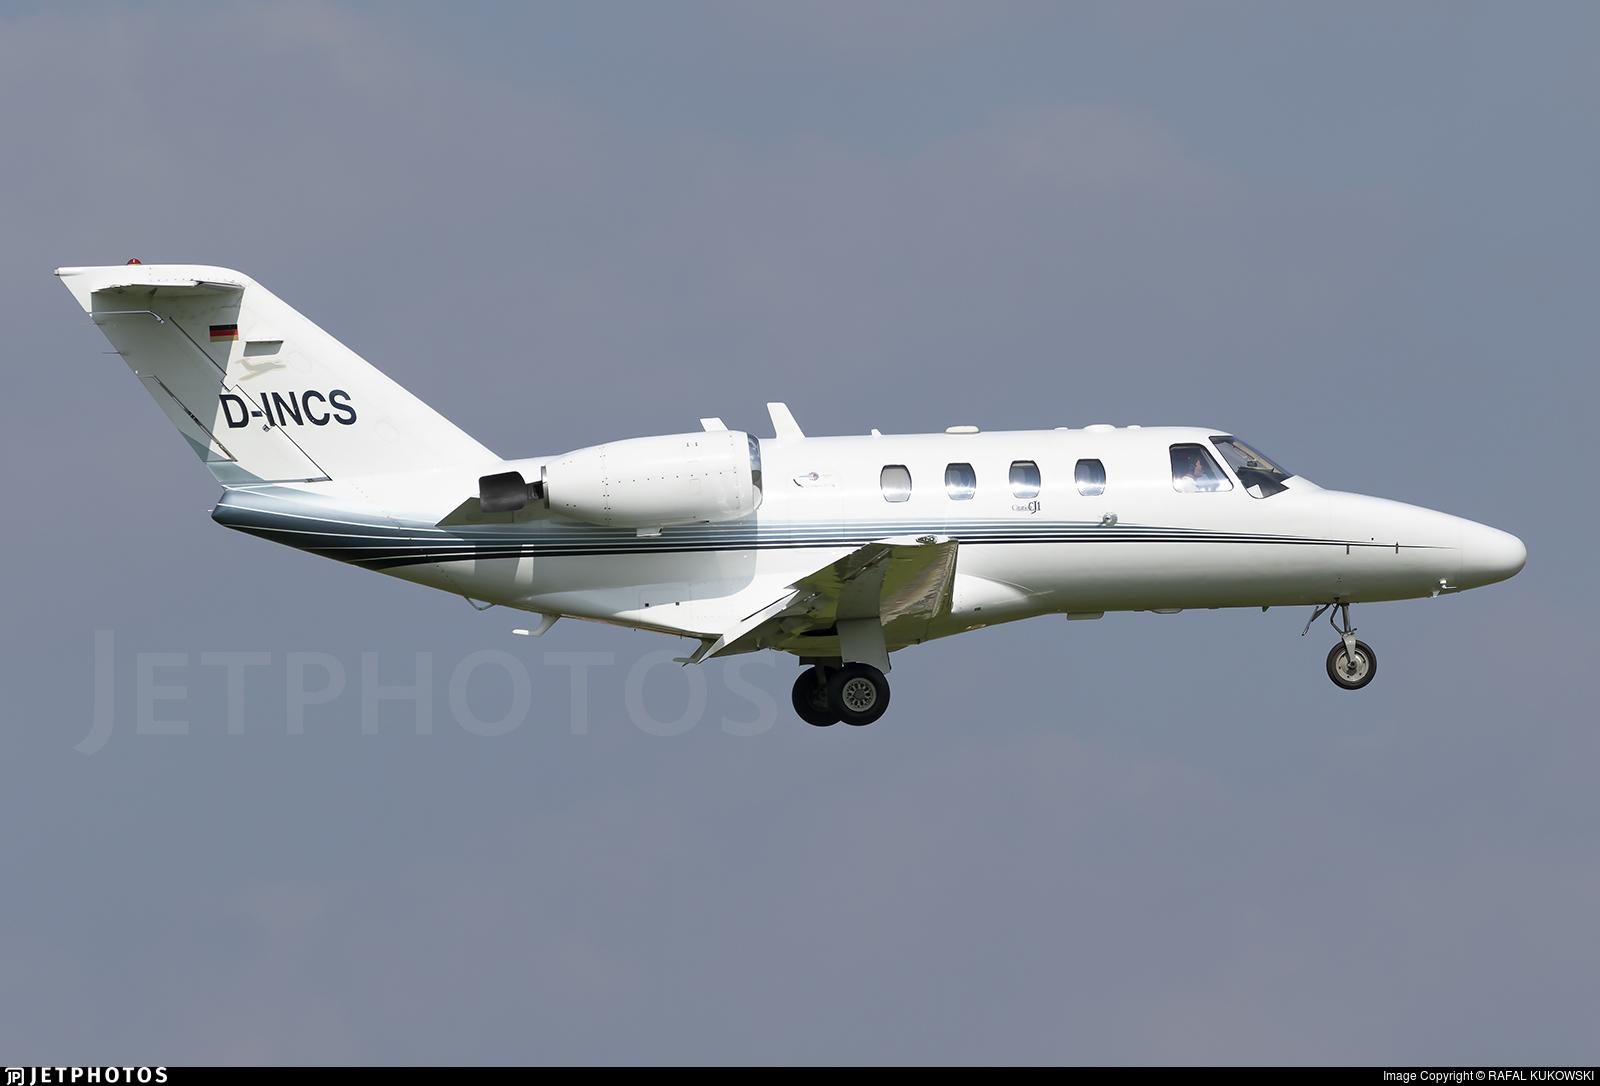 D-INCS - Cessna 525 CitationJet 1 - JK Jetkontor